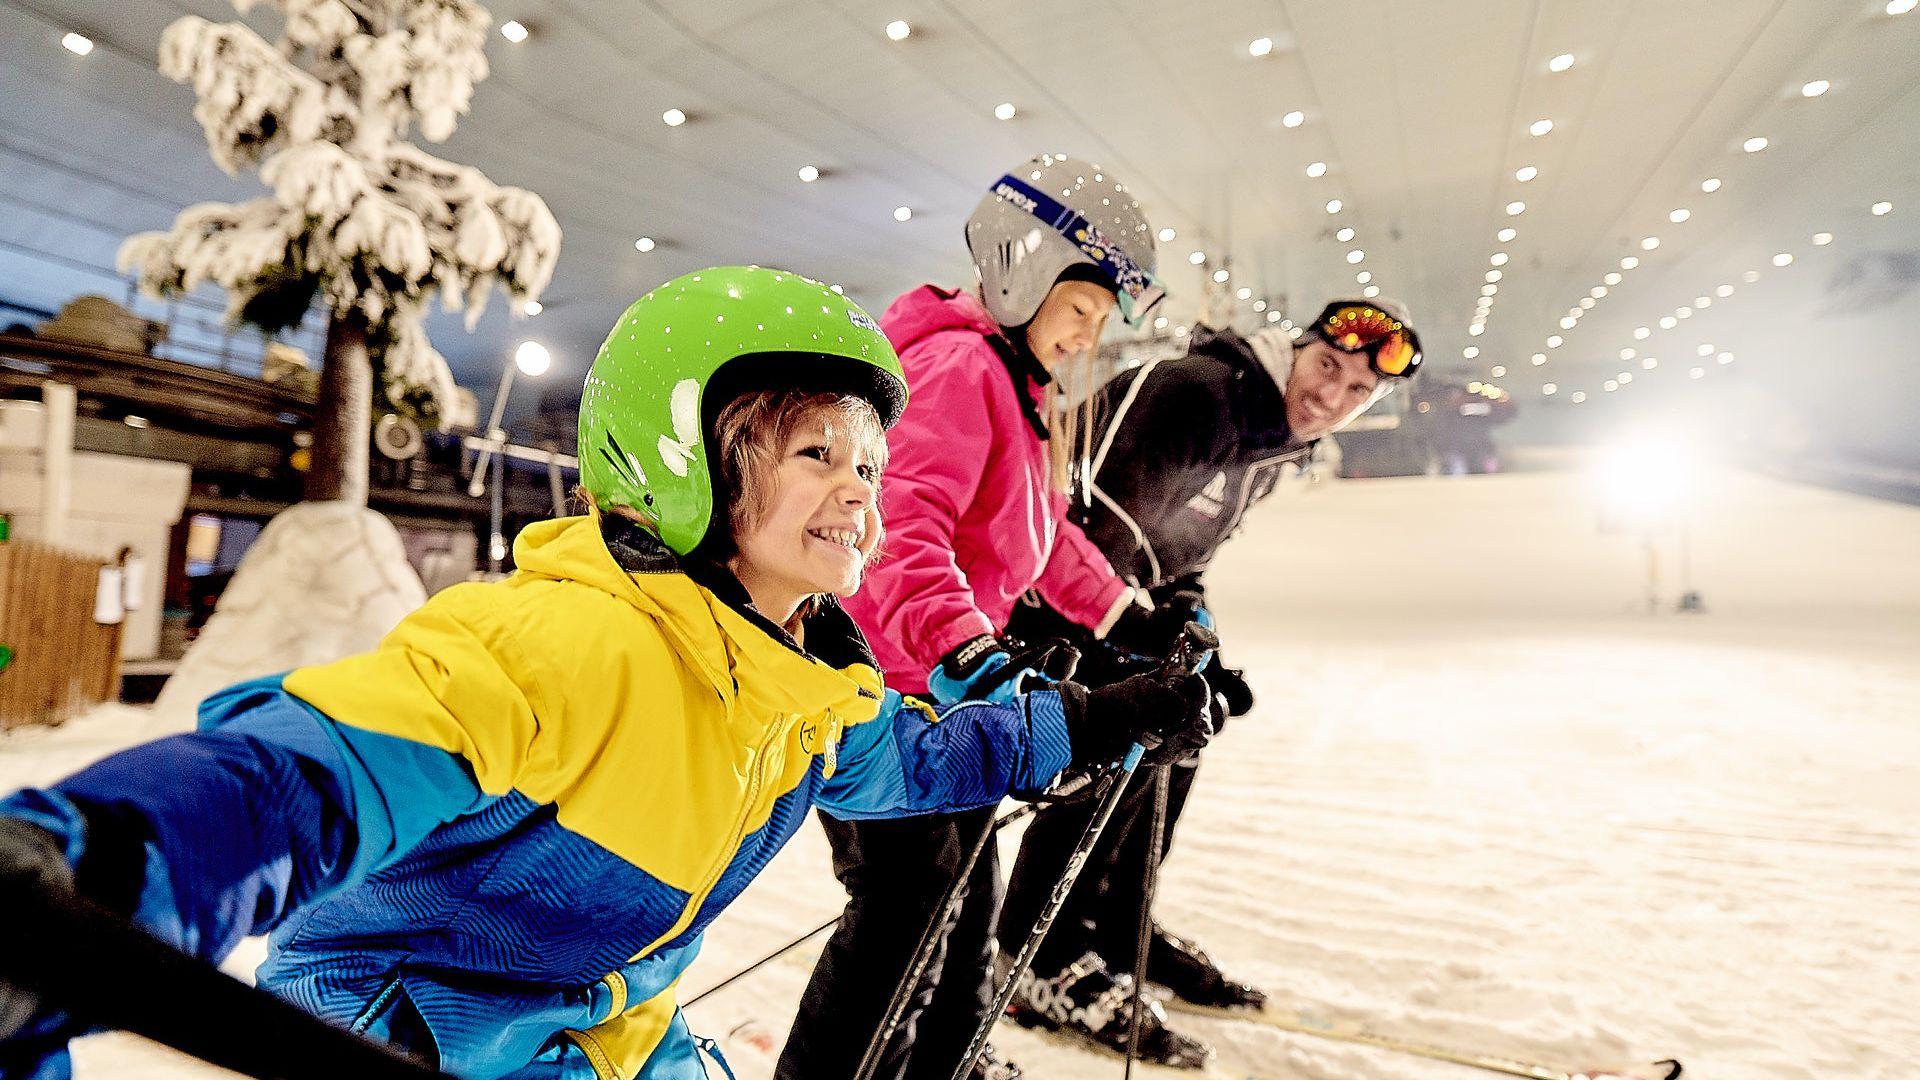 Ski Dubai Ski Slope: Fast Track